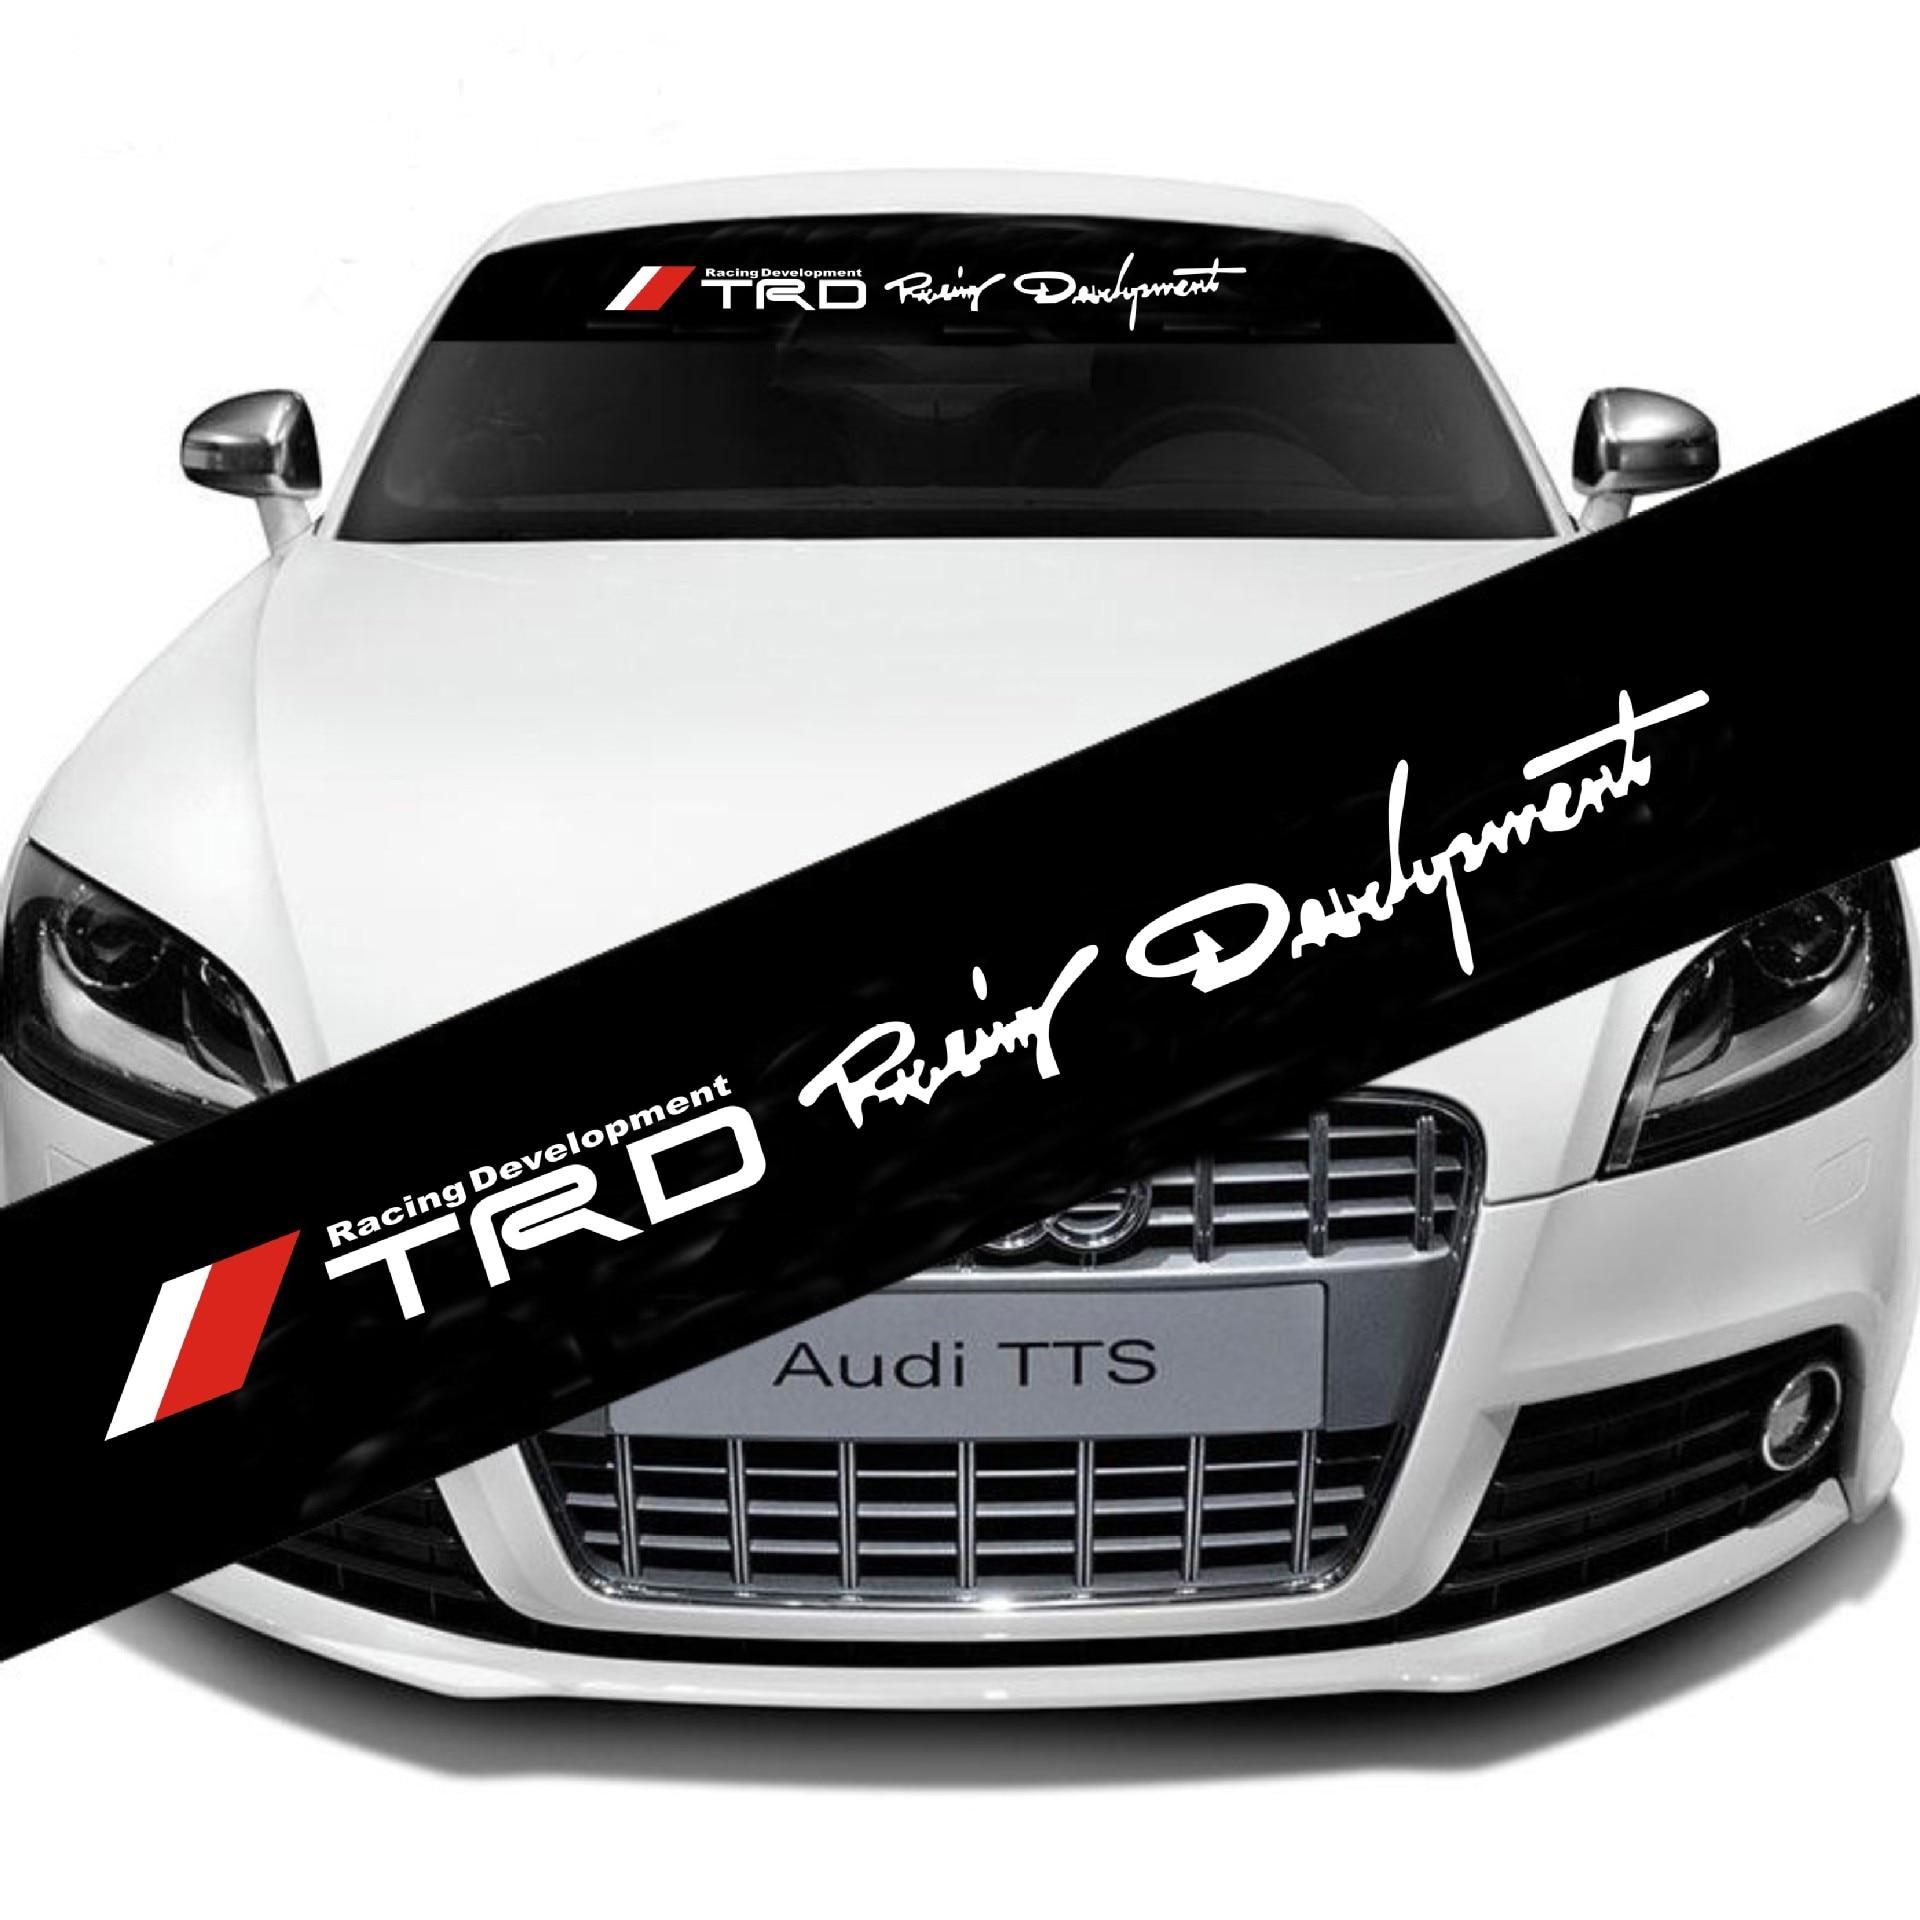 Para toyota chr prius aygo supra corolla 2015 bmw x1 x3 carro dianteiro traseiro windshield adesivo estilo do carro automóvel tuning accessori